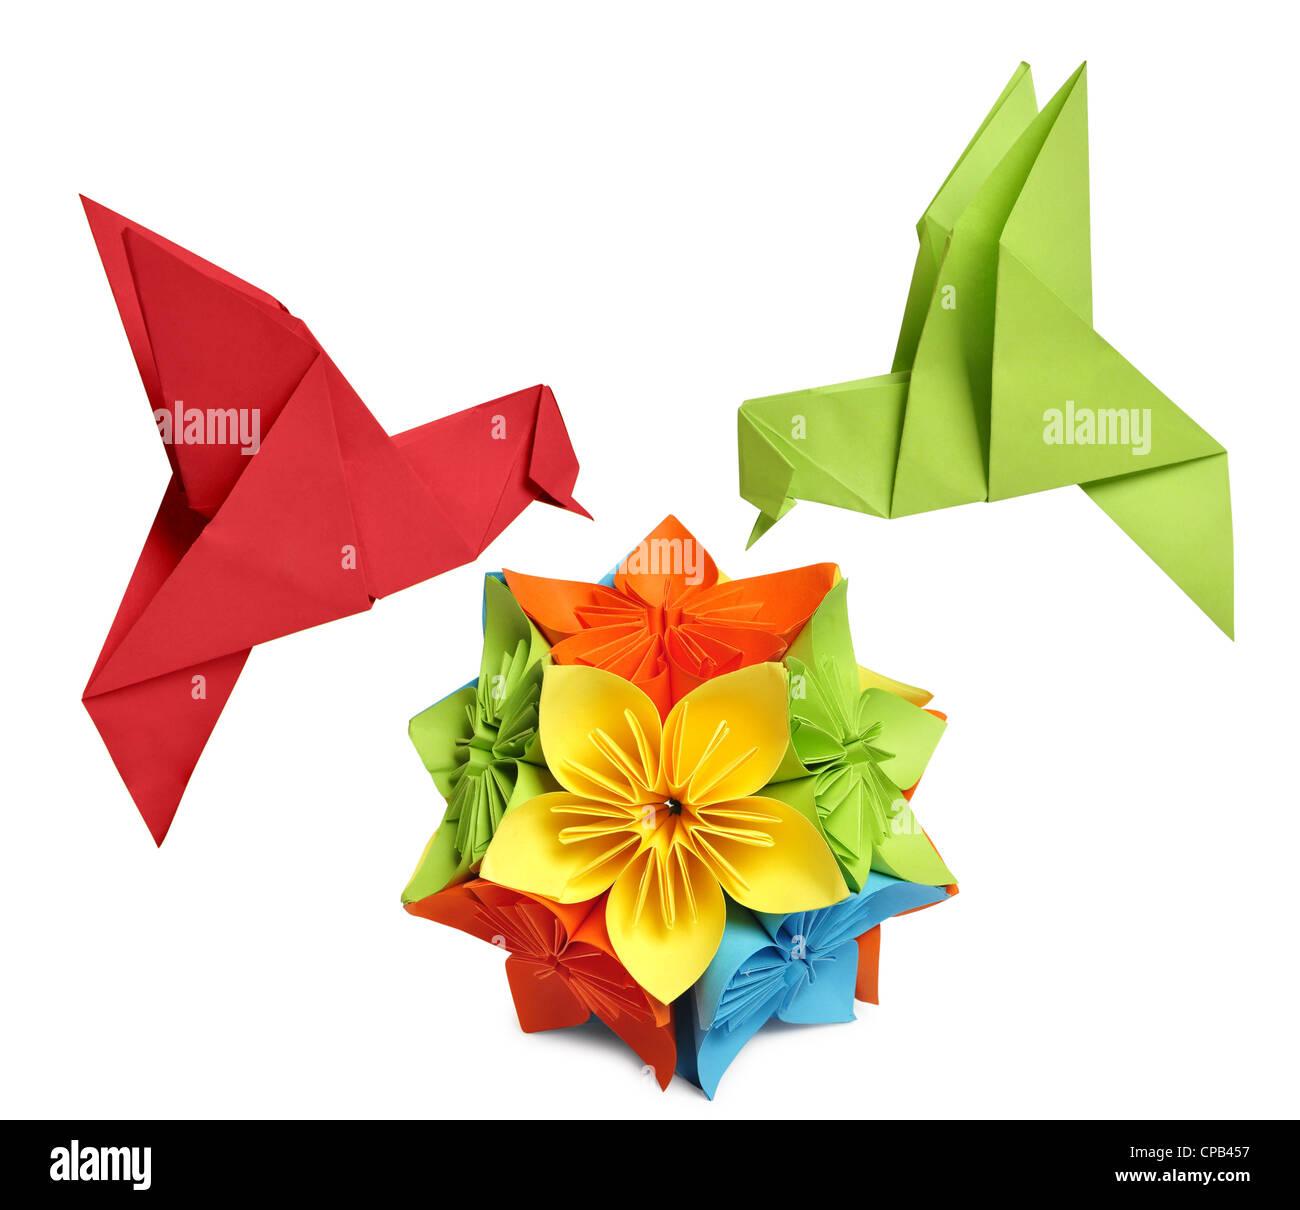 Origami Kolibri über Blume Kusudama auf weißem Hintergrund Stockbild